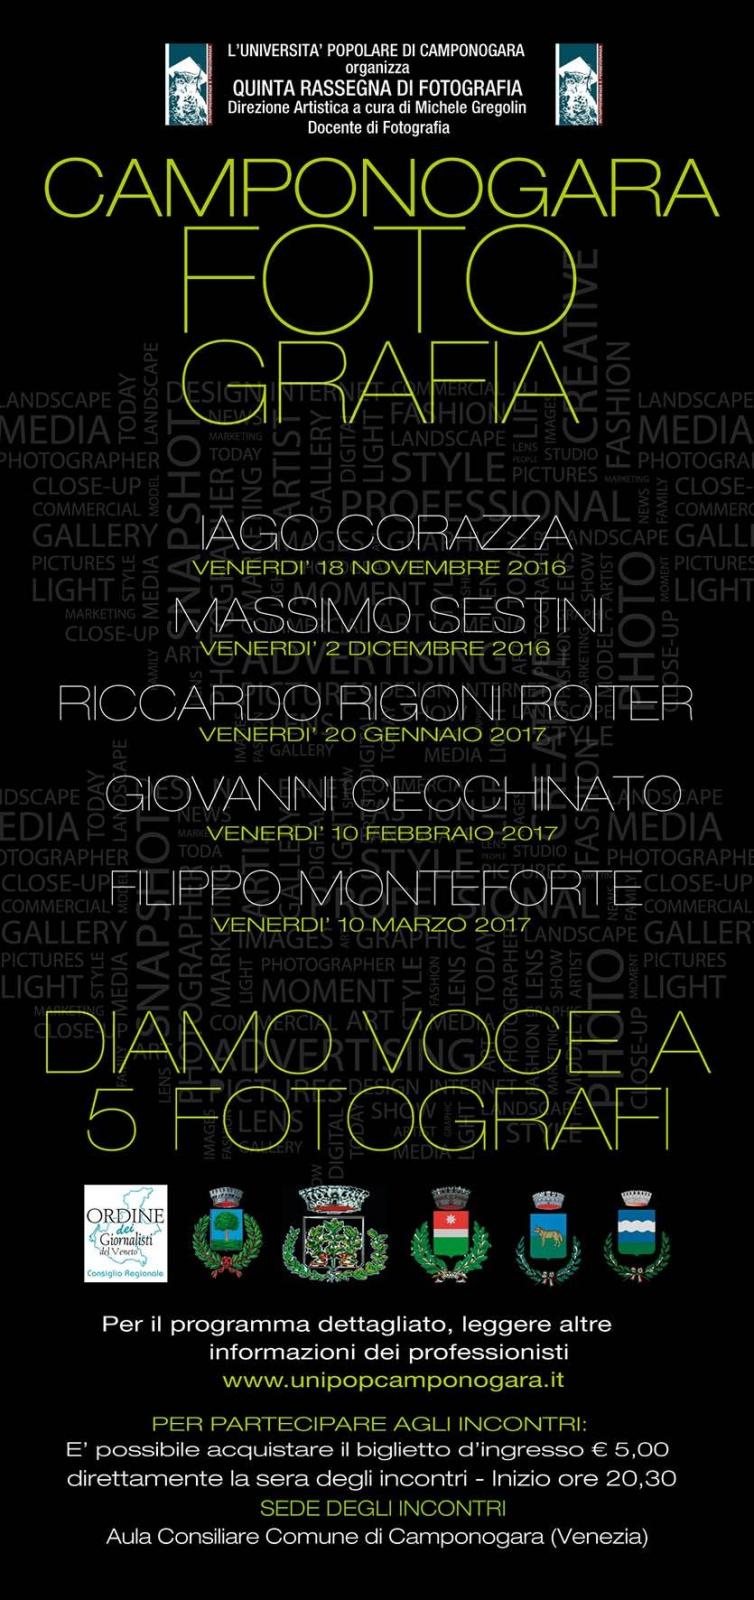 10/02/17 - Camponogara Fotografia